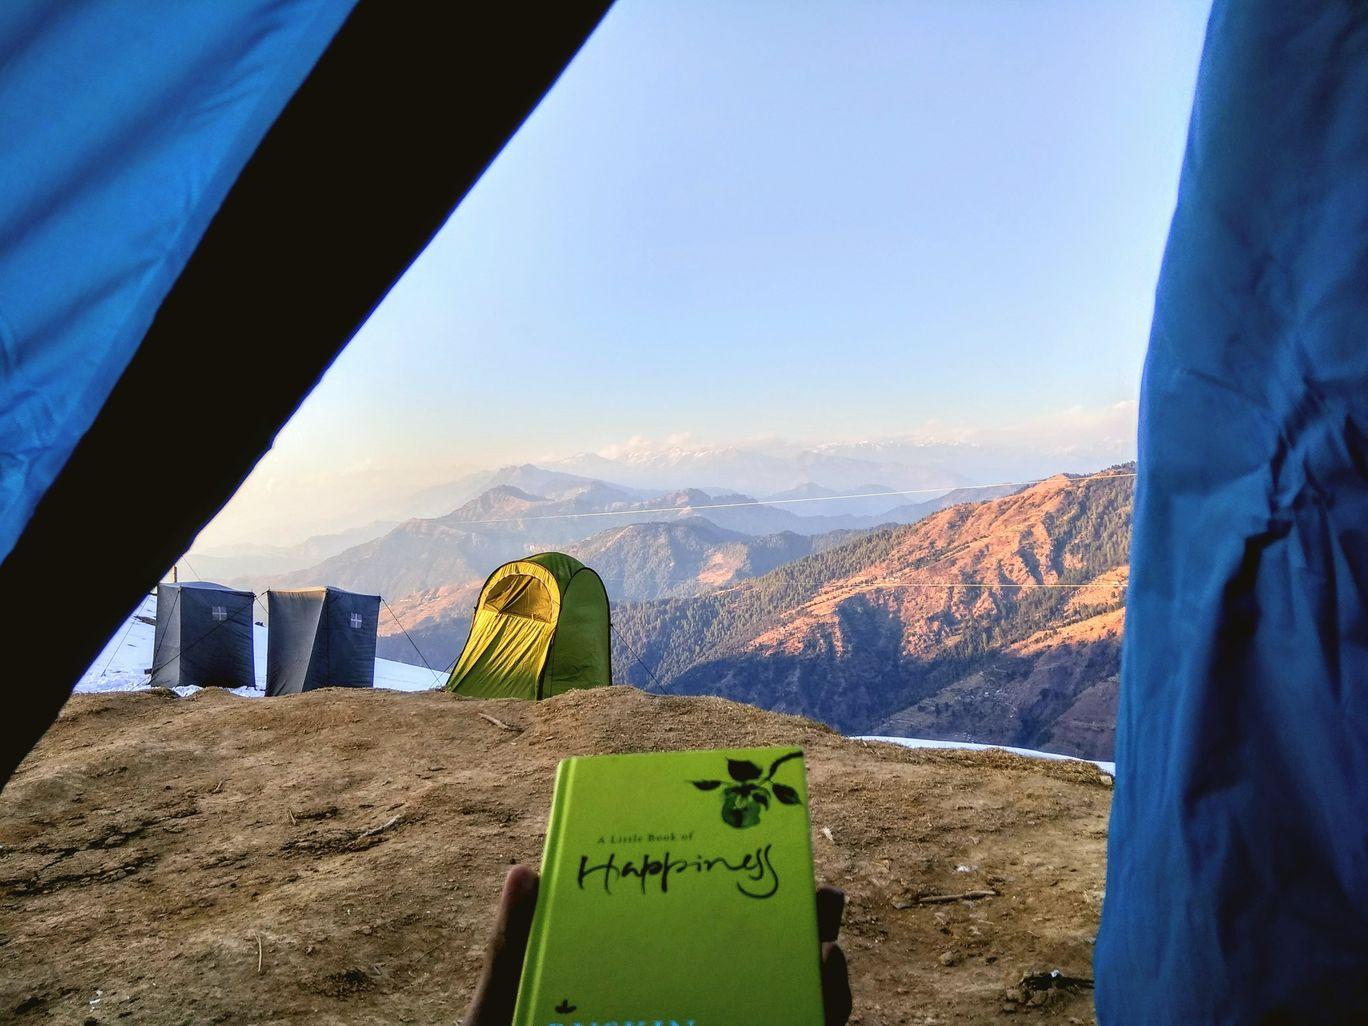 Photo of Himachal Pradesh By Mohit Goyal